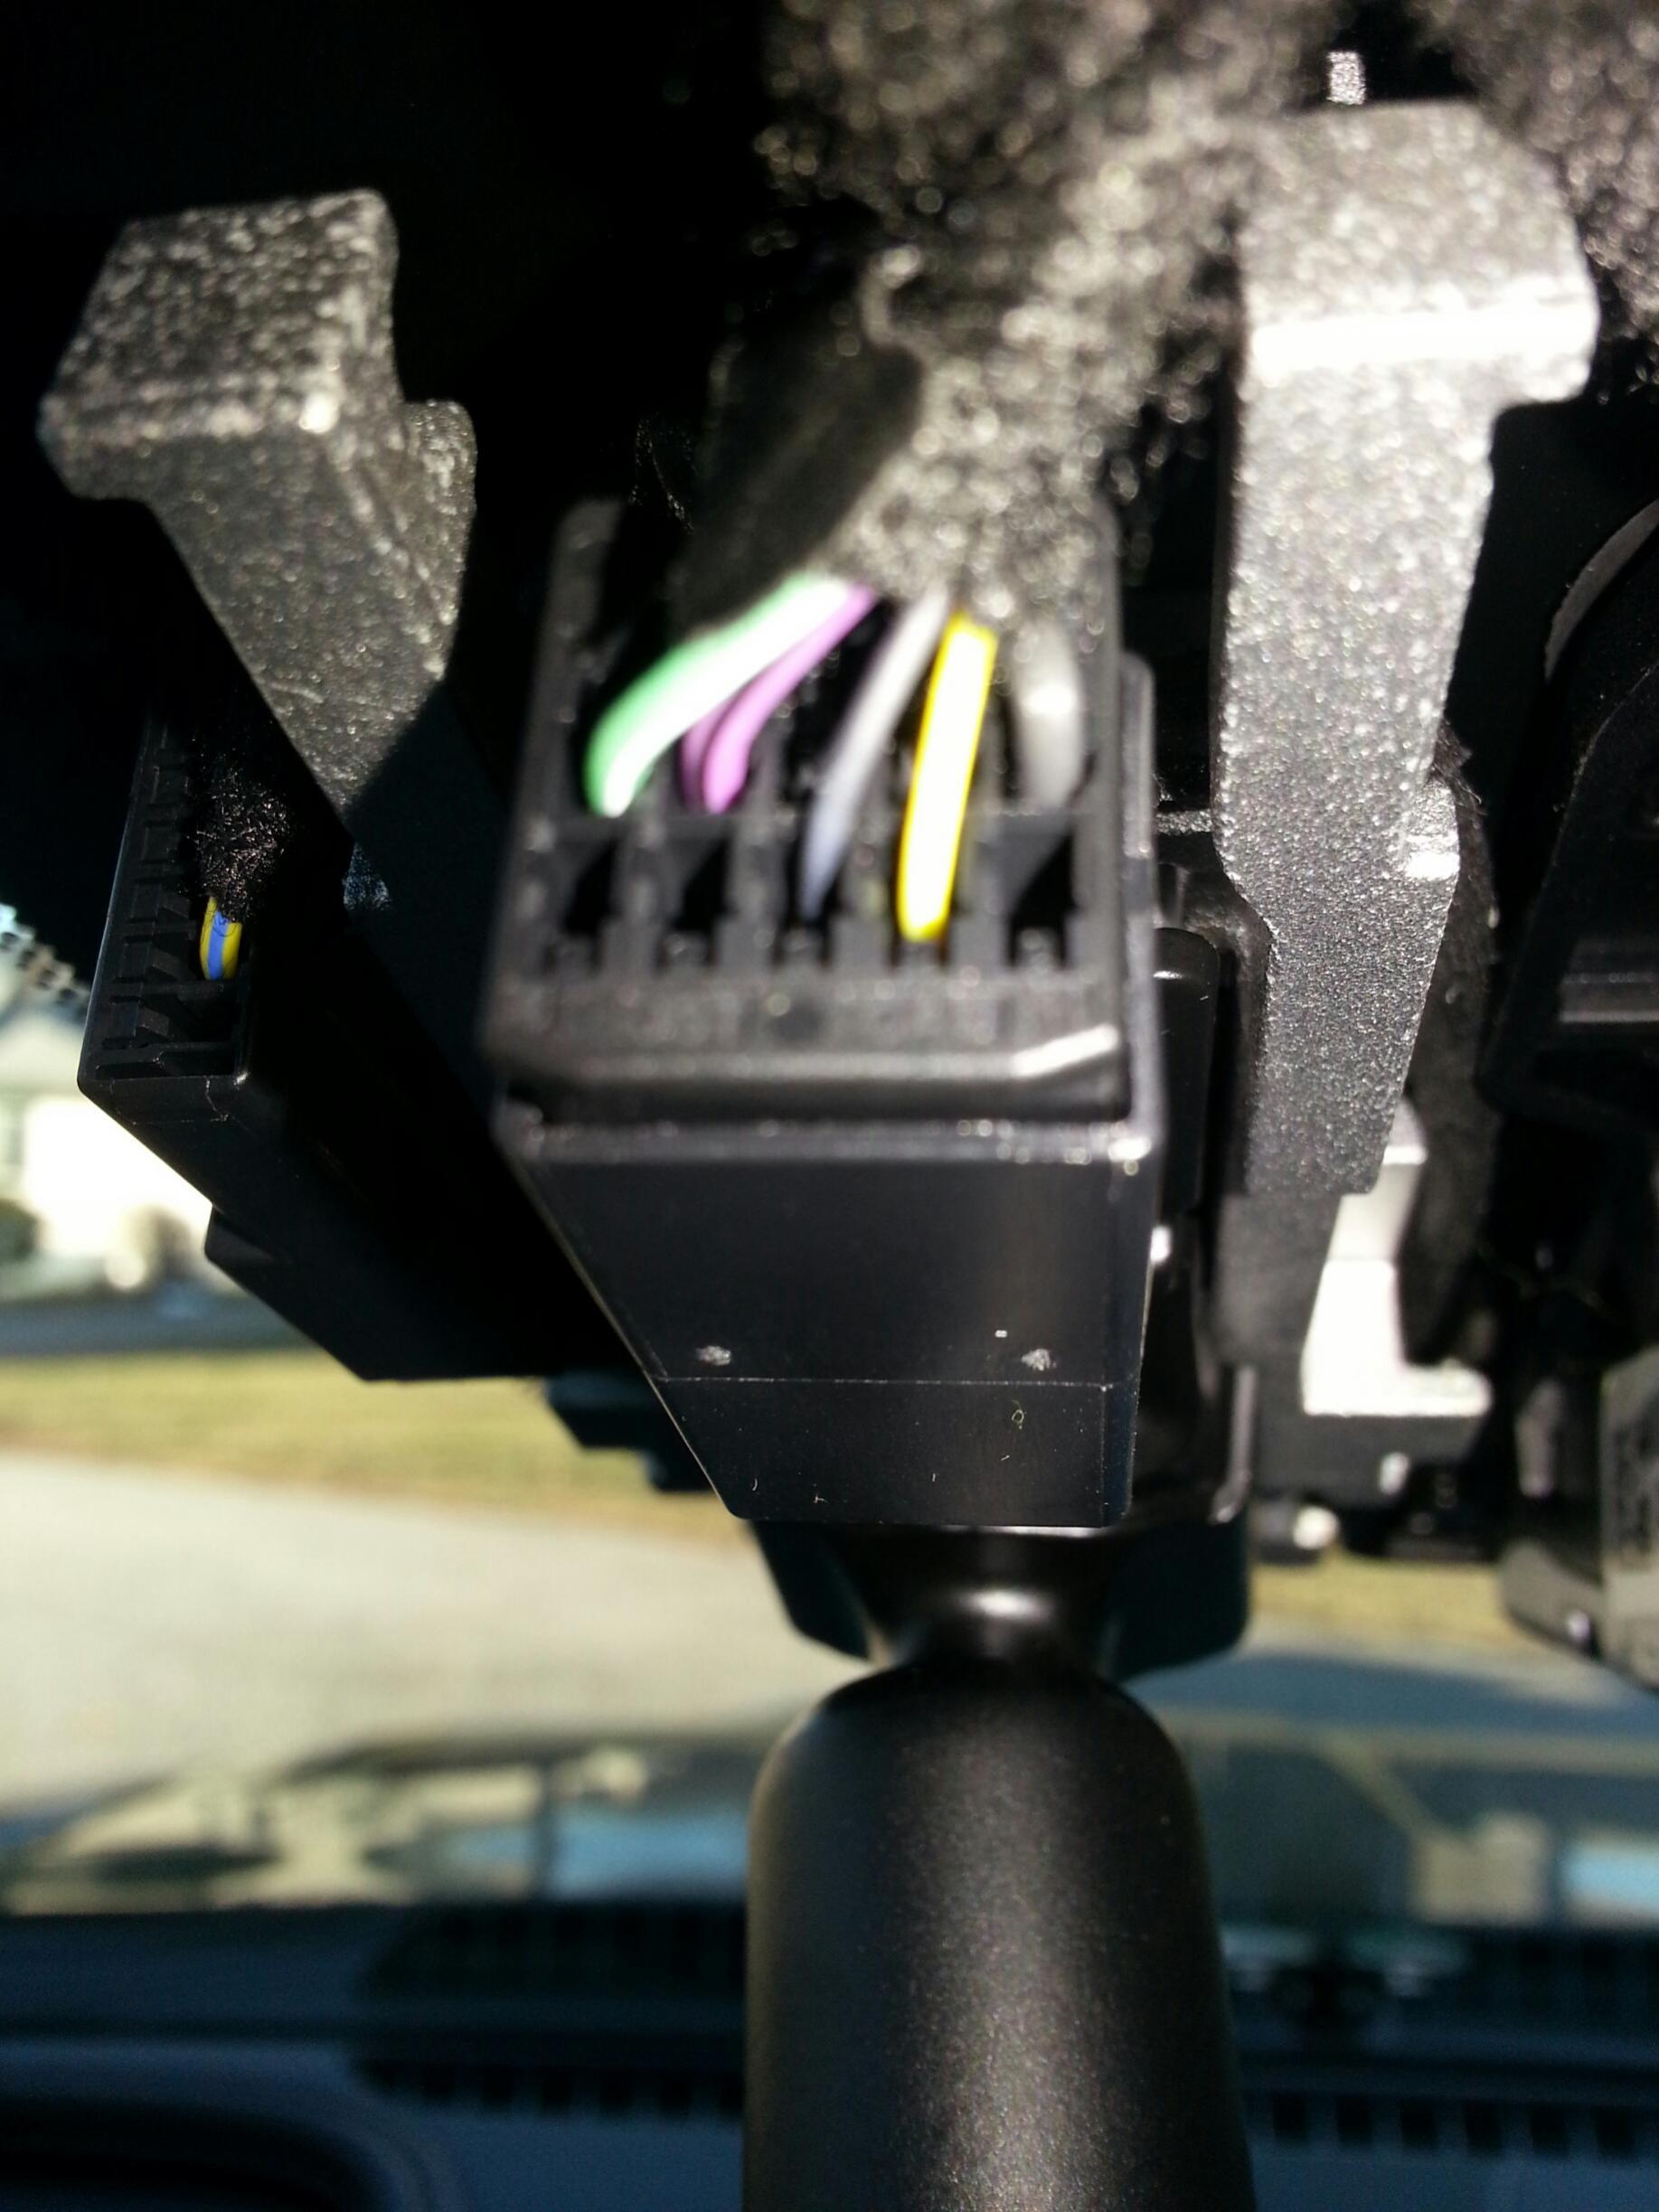 2013 Silverado Stereo Wire Diagram 2014 Impala Ltz Mirror Tap Blend Mount For Radar Detector